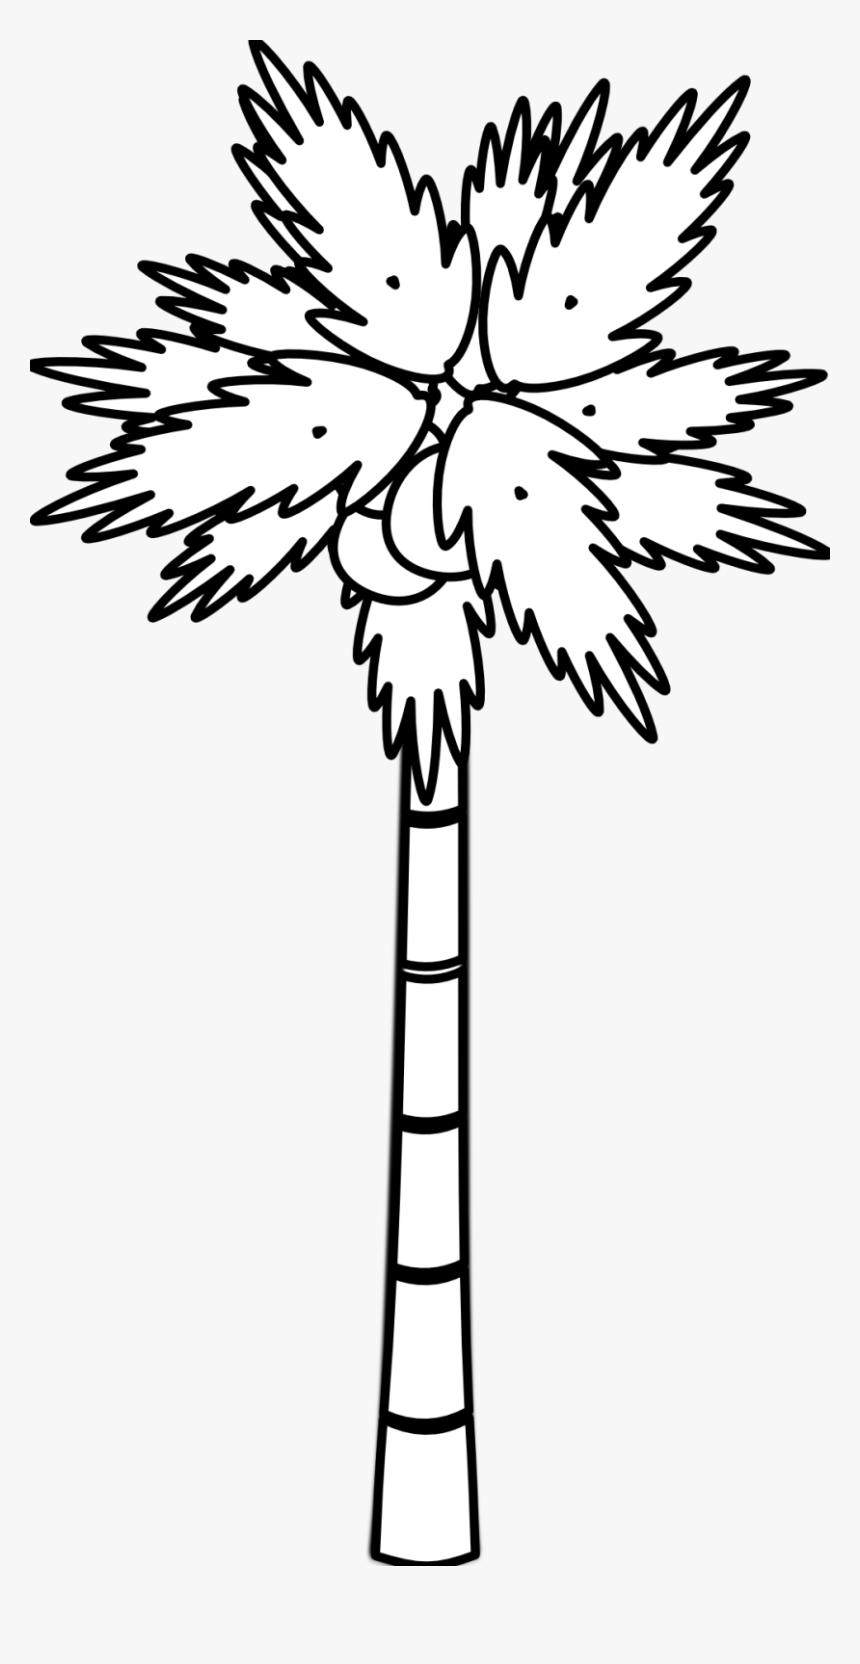 Palm Tree Clipart Black And White : clipart, black, white, Clipart, Black, White, Tree,, Download, Transparent, Image, PNGitem